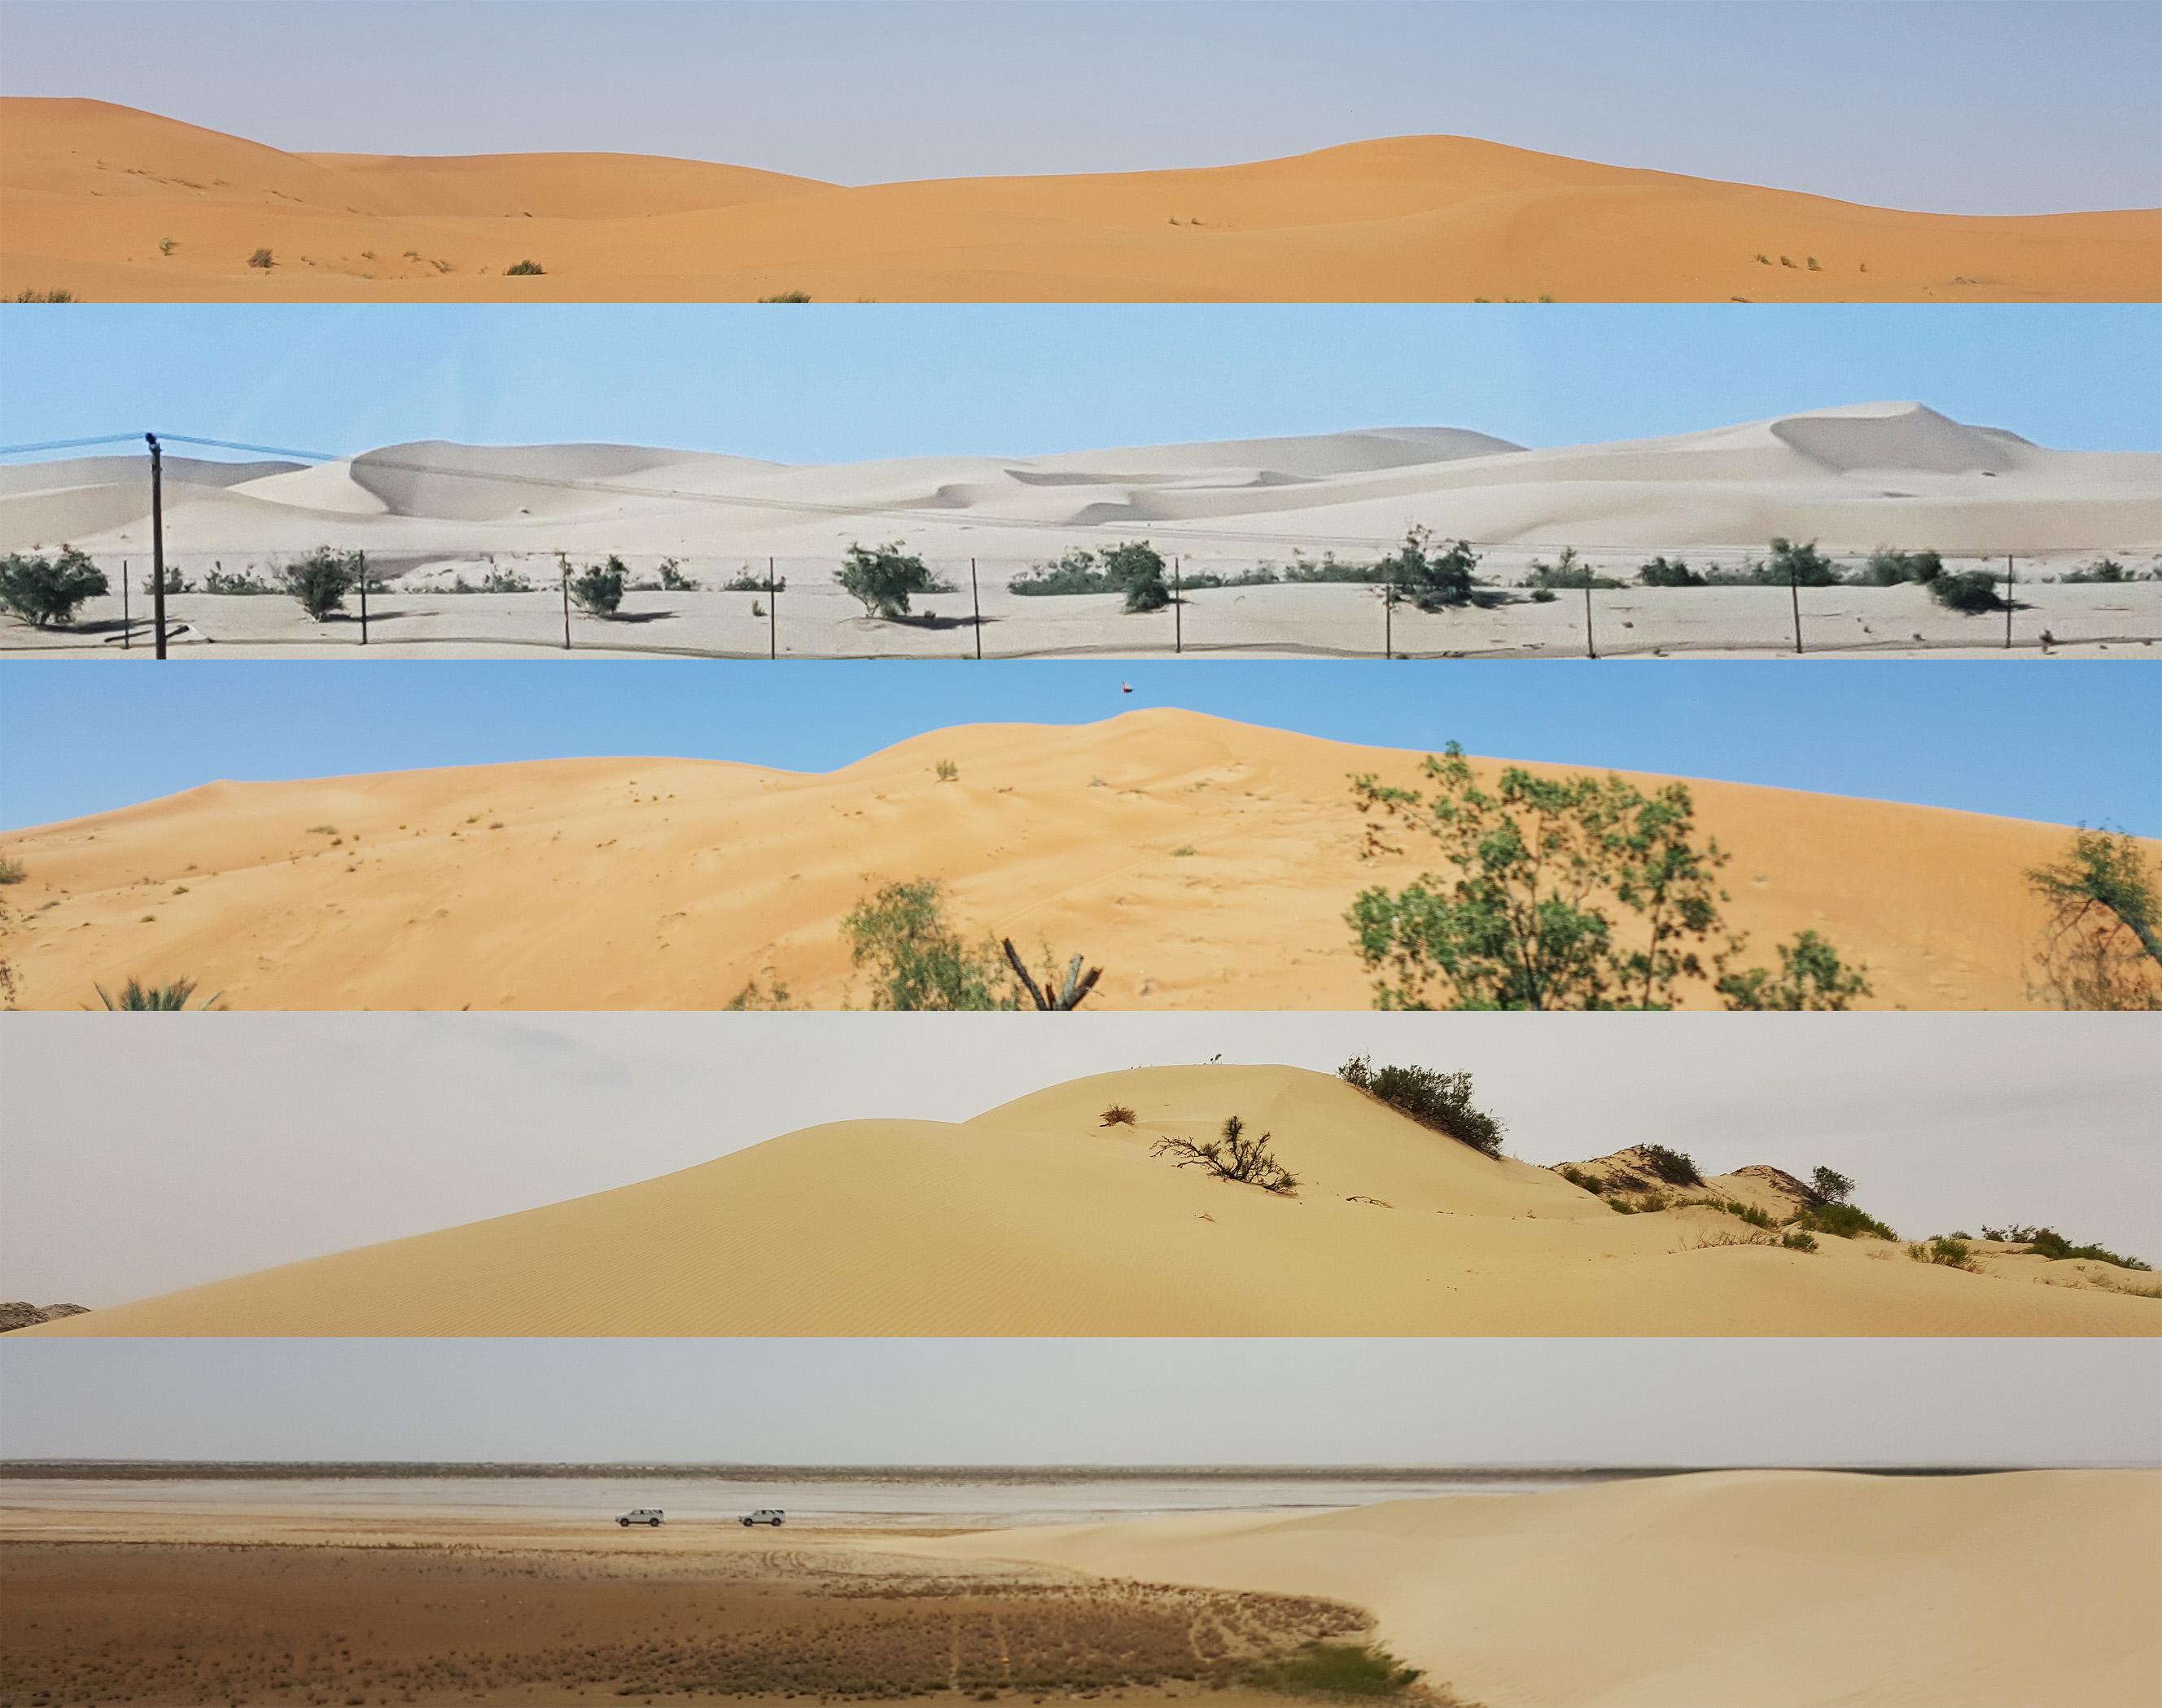 Abu Dhabi, Al Ain, Deserti, Emirati Arabi, ph. Panaiotis Kruklidis